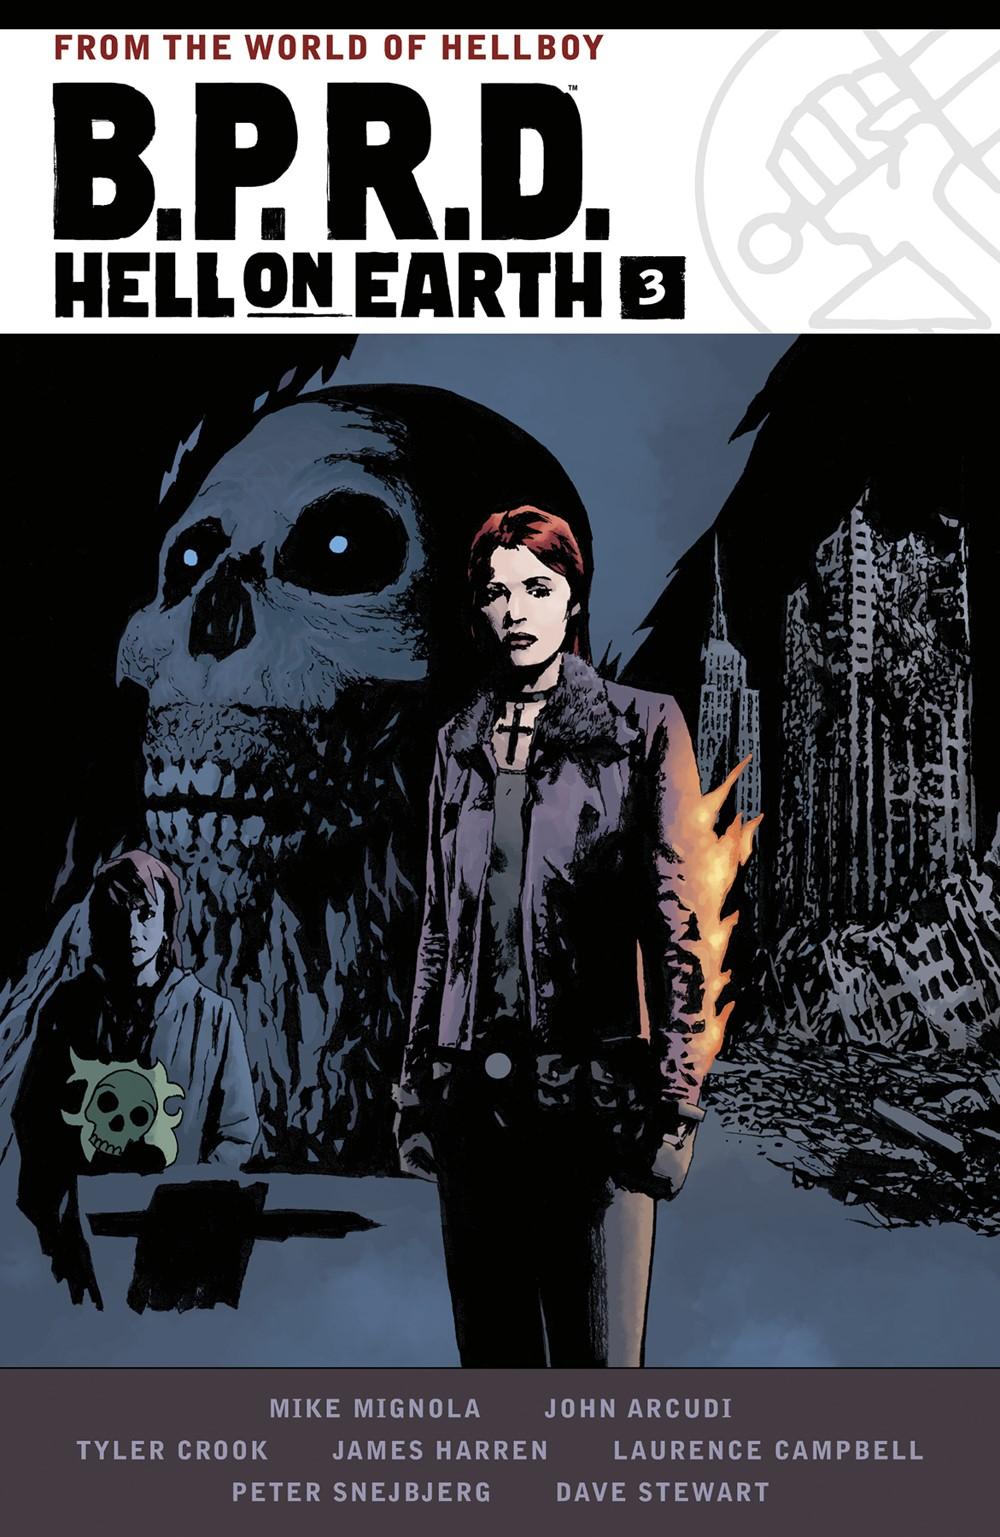 BPRDHOEV3_TPB_CVR_4x6_SOL Dark Horse Comics September 2021 Solicitations